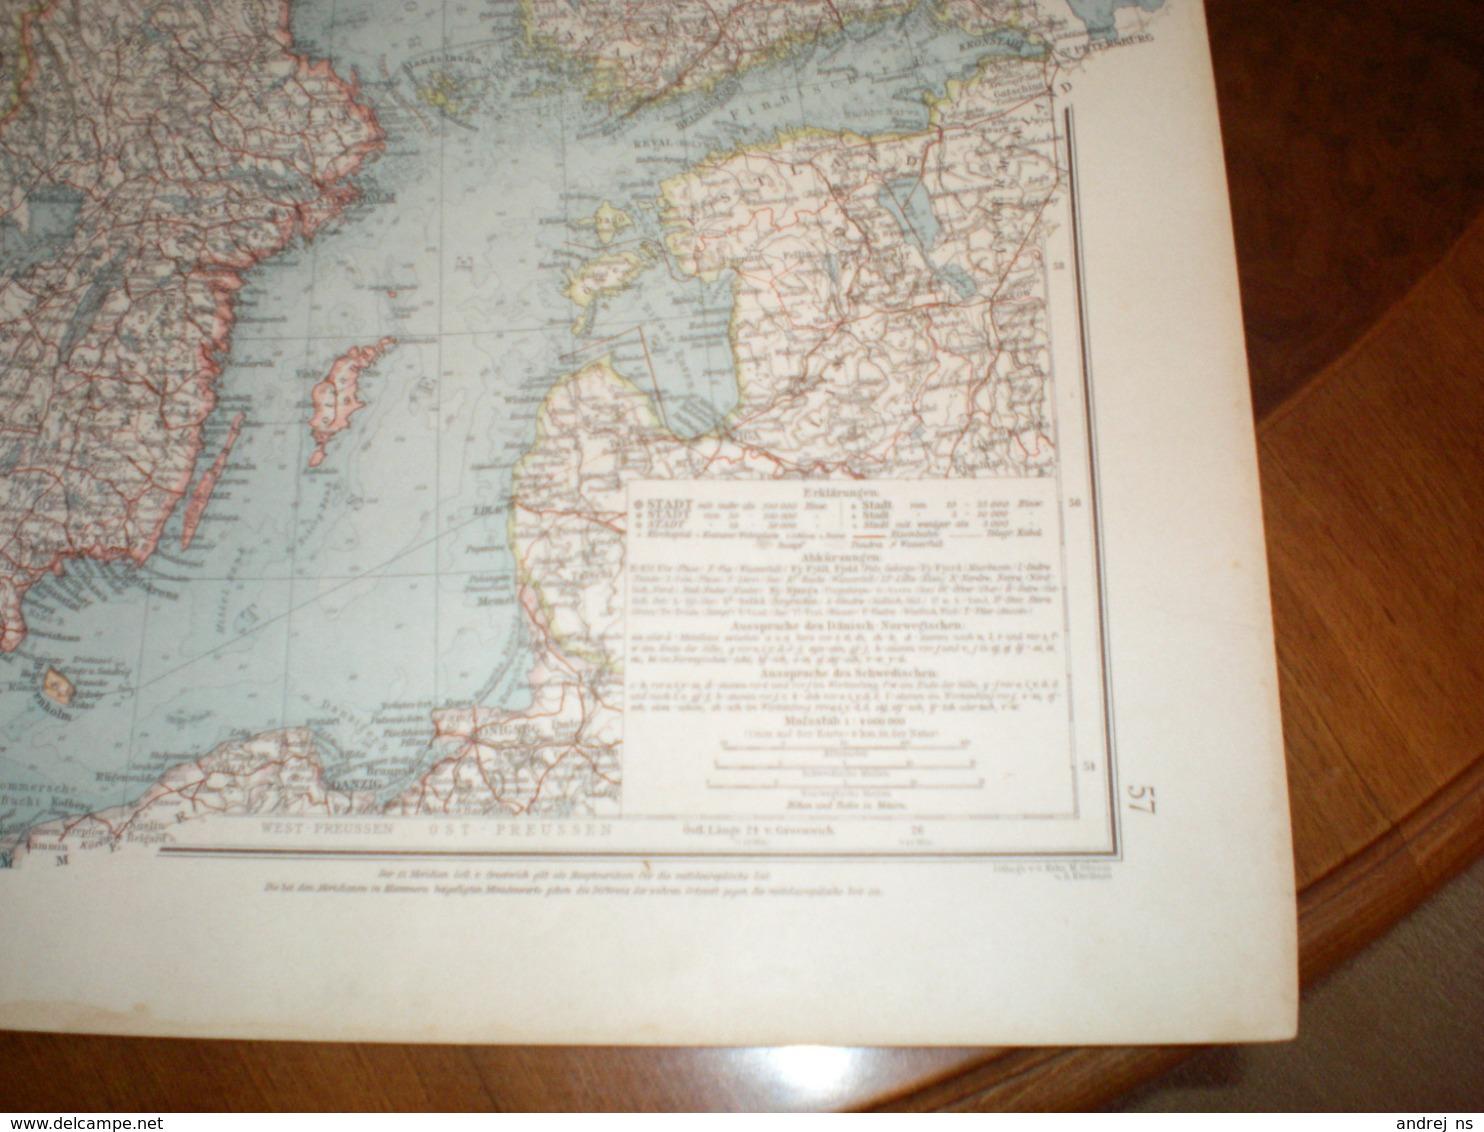 Schweden Und Norwegen Volks Und Familien Atlas A Shobel Leipzig 1901 Big Map - Cartes Géographiques